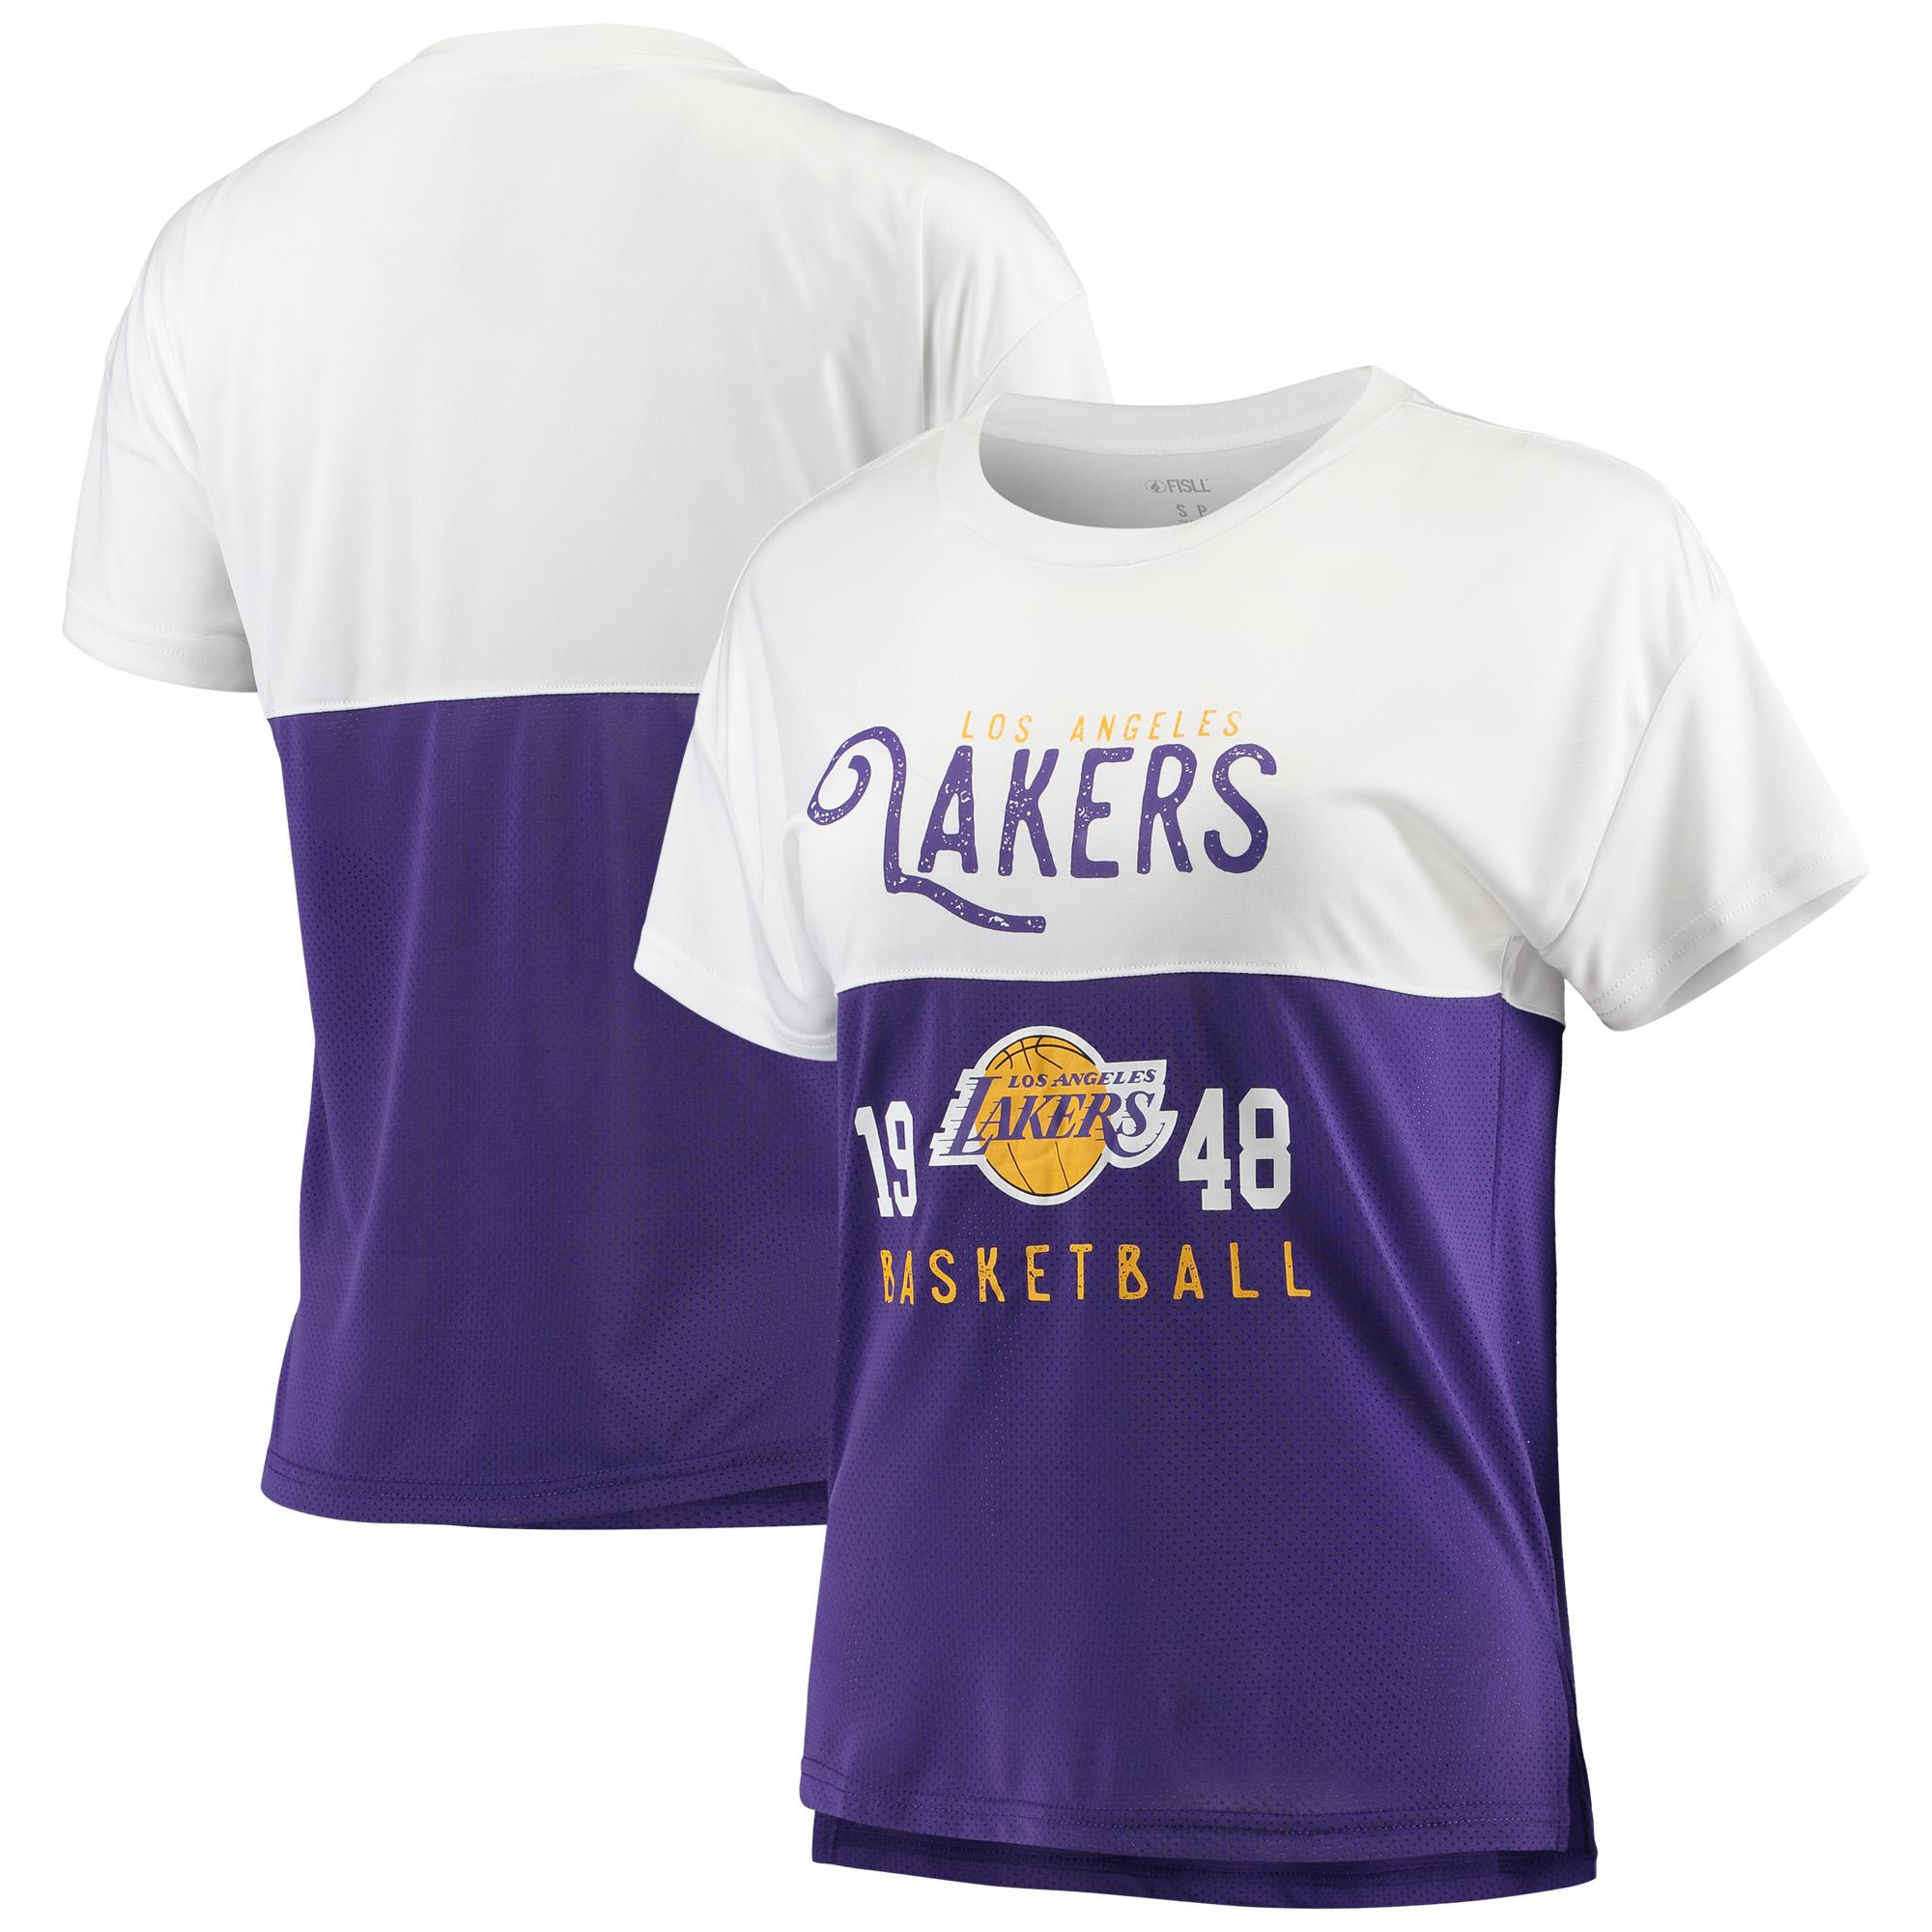 Los Angeles Lakers FISLL Women's Interlock Mesh Combo Short Sleeve T-Shirt - White/Purple